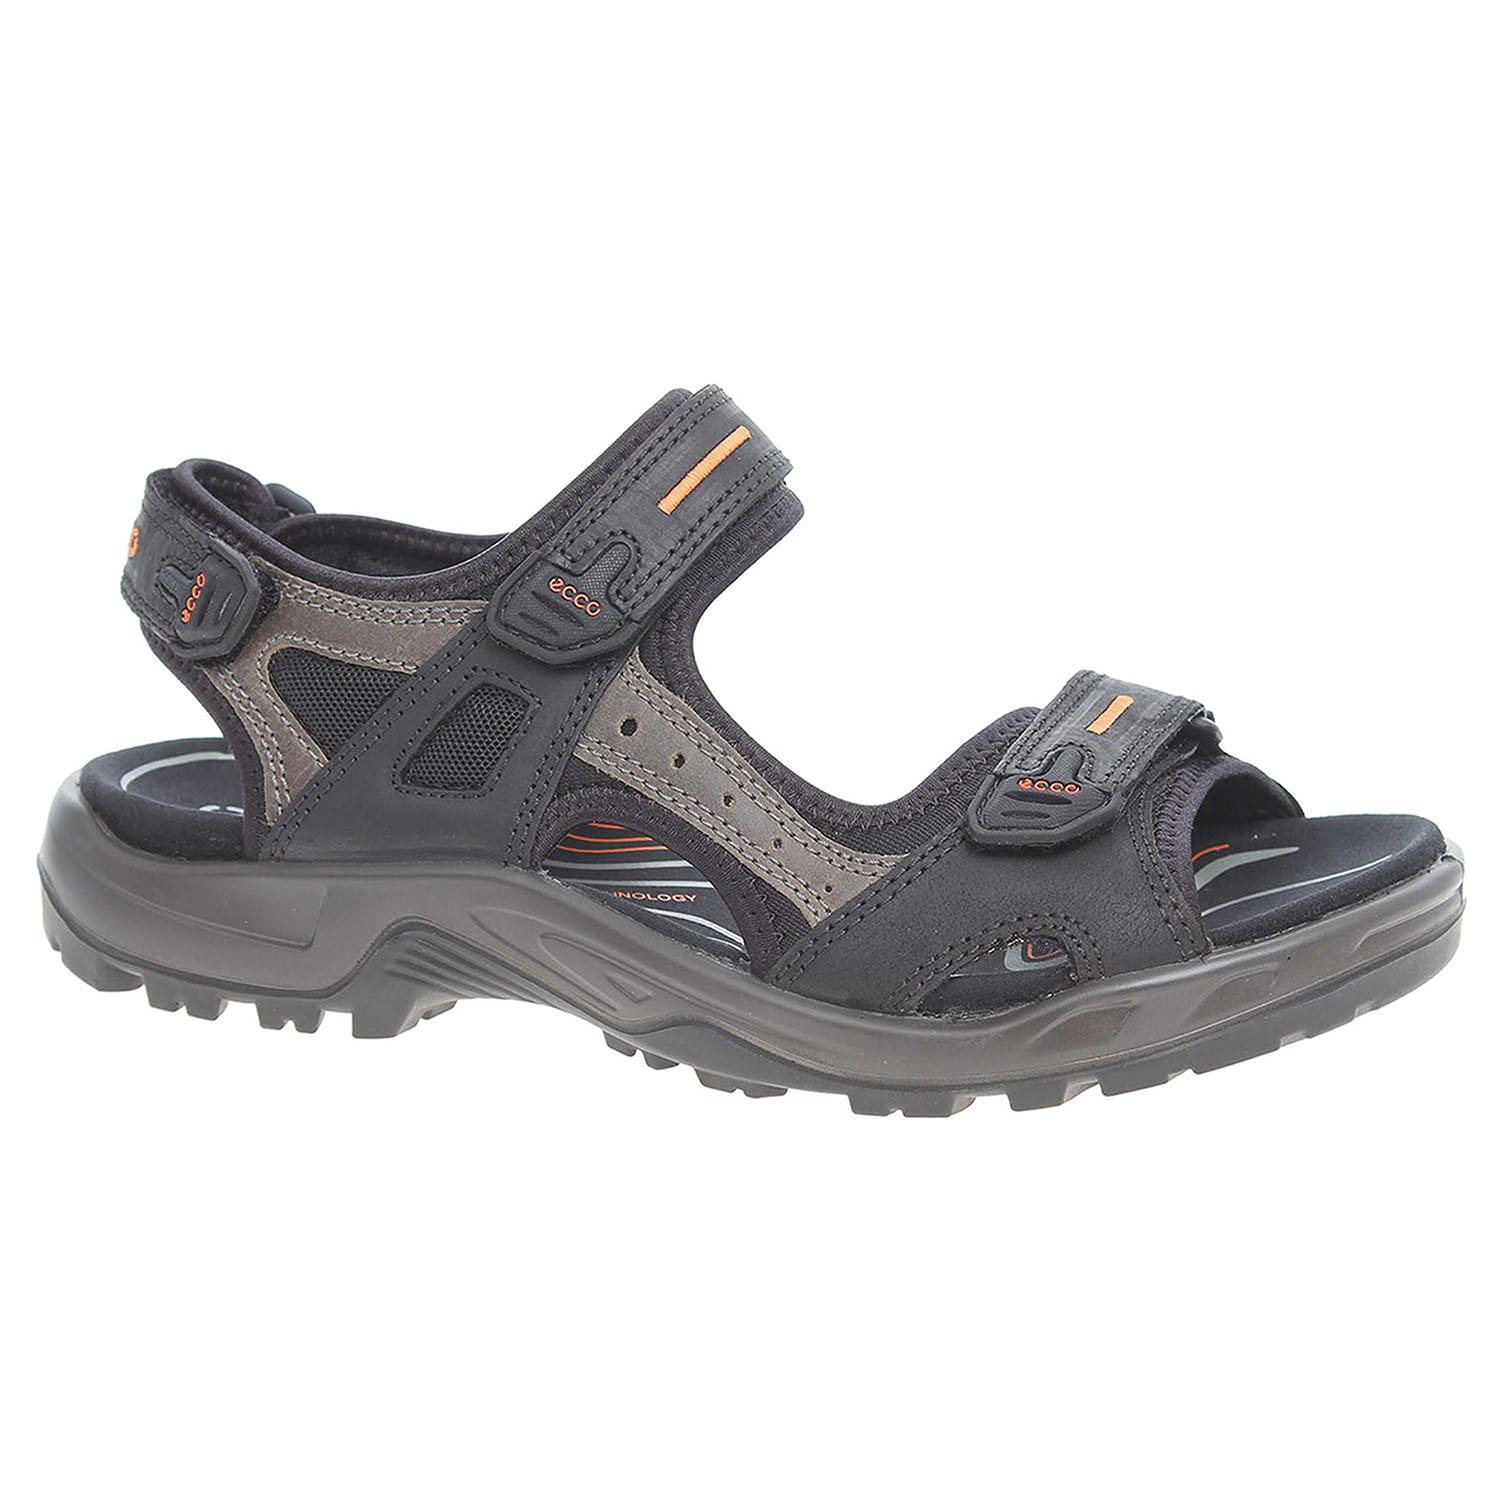 ef001cdc279b detail Pánské sandály Ecco Offroad 06956450034 black-mole-black